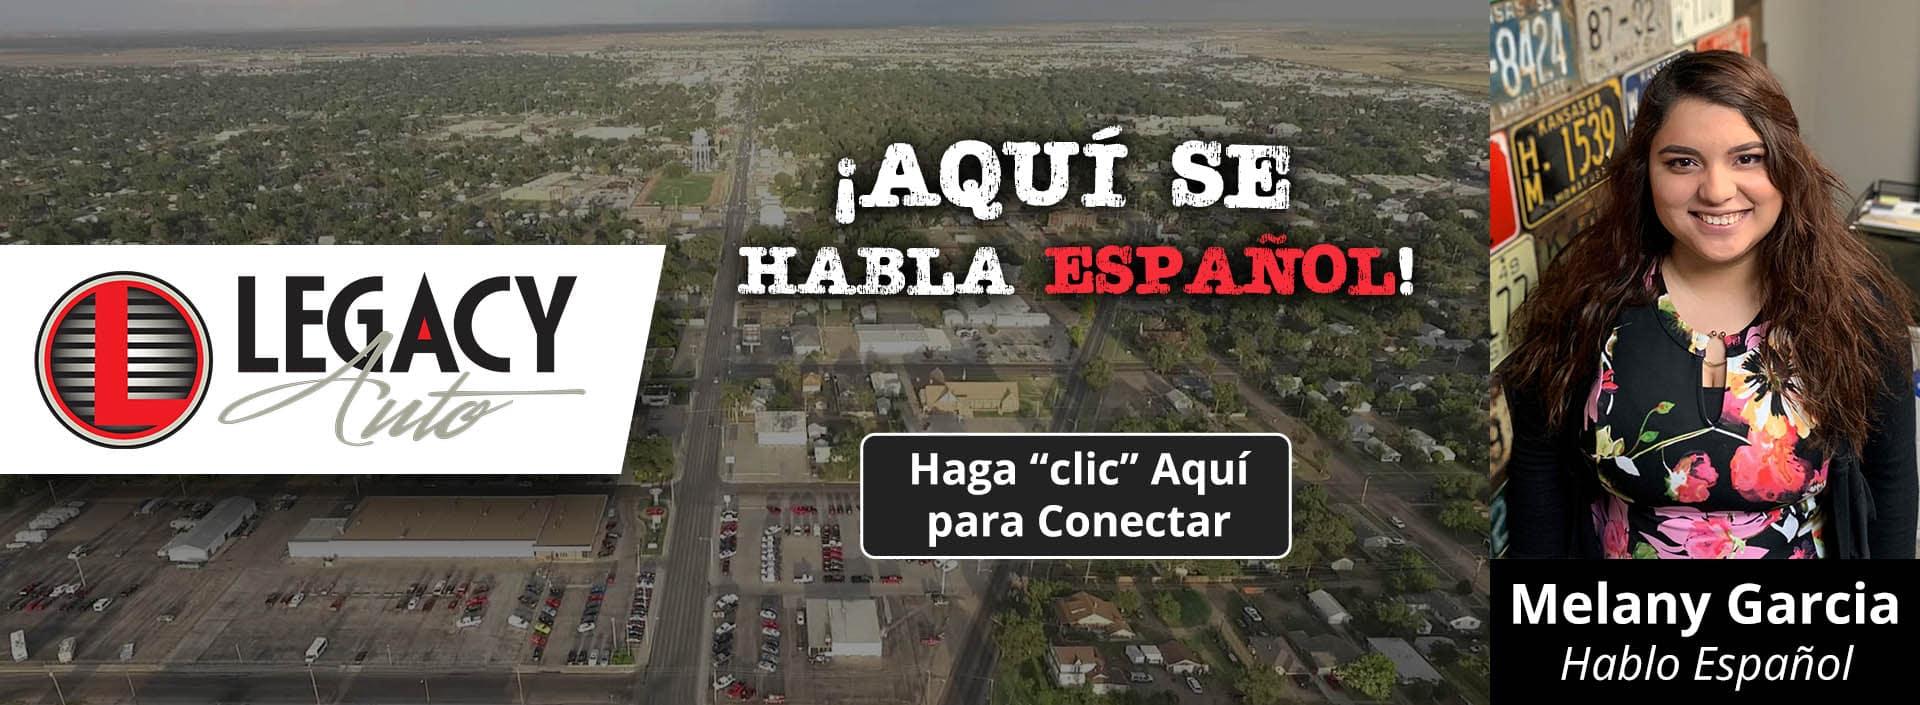 We Speak Spanish - Legacy Auto Center